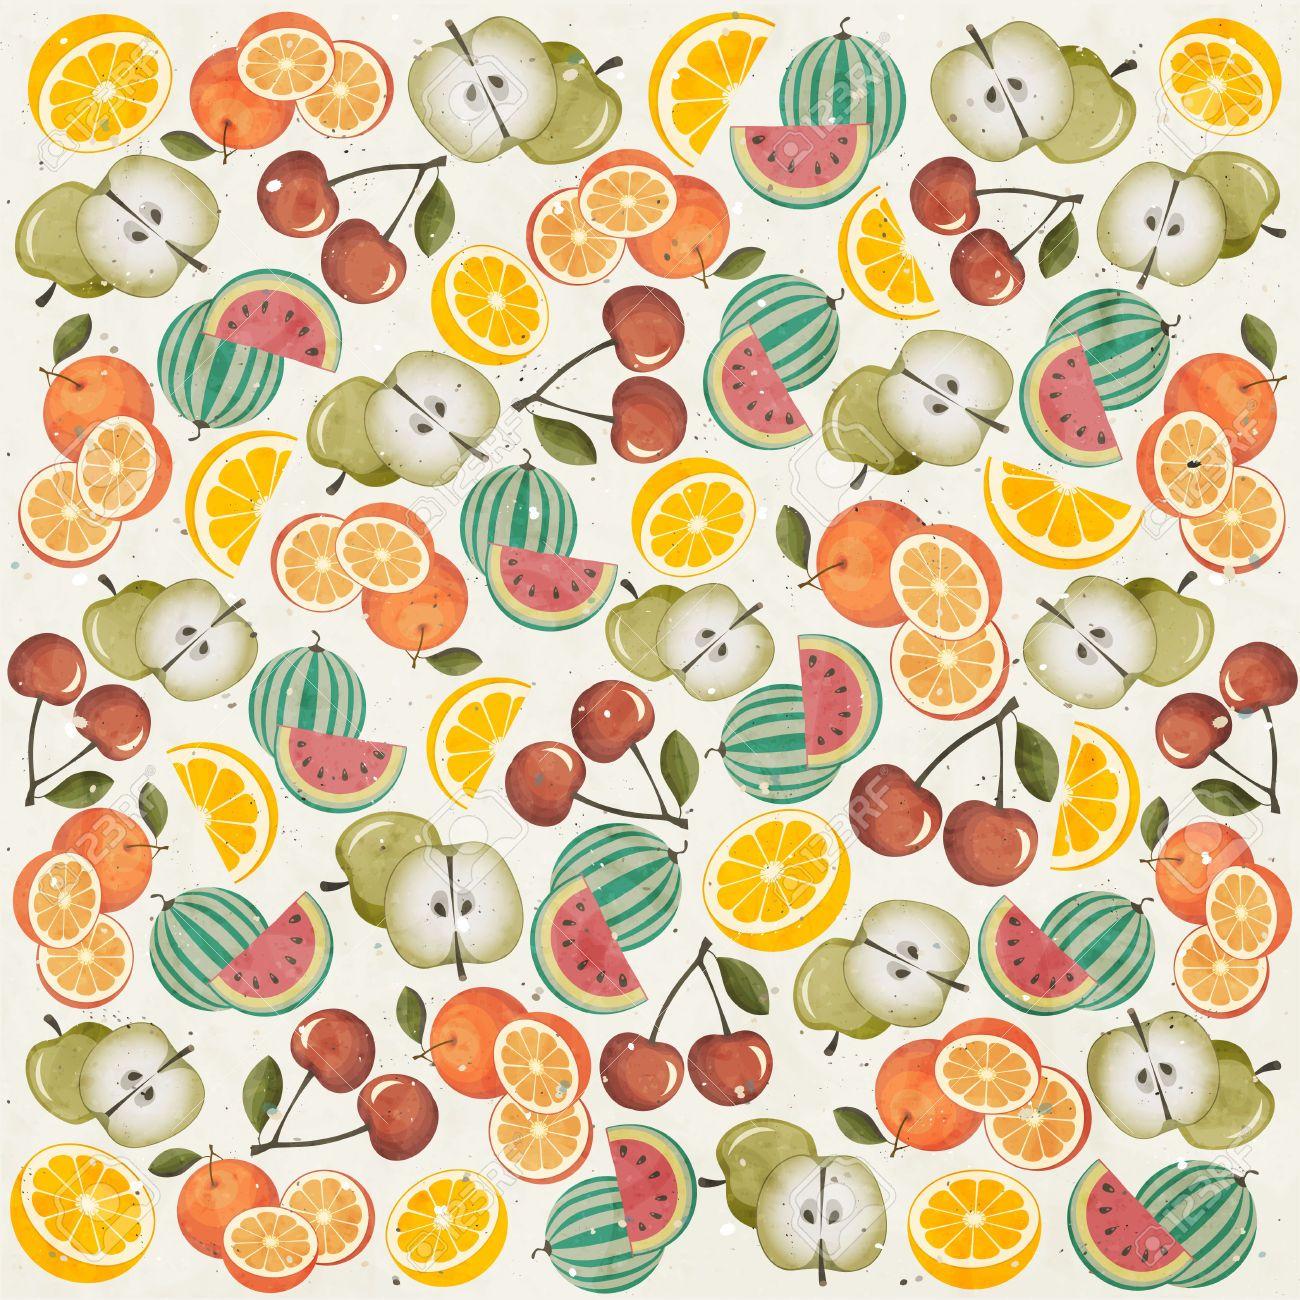 Retro Wallpaper Theme Vintage Style Wallpaper Fruit Wallpaper Design Elements